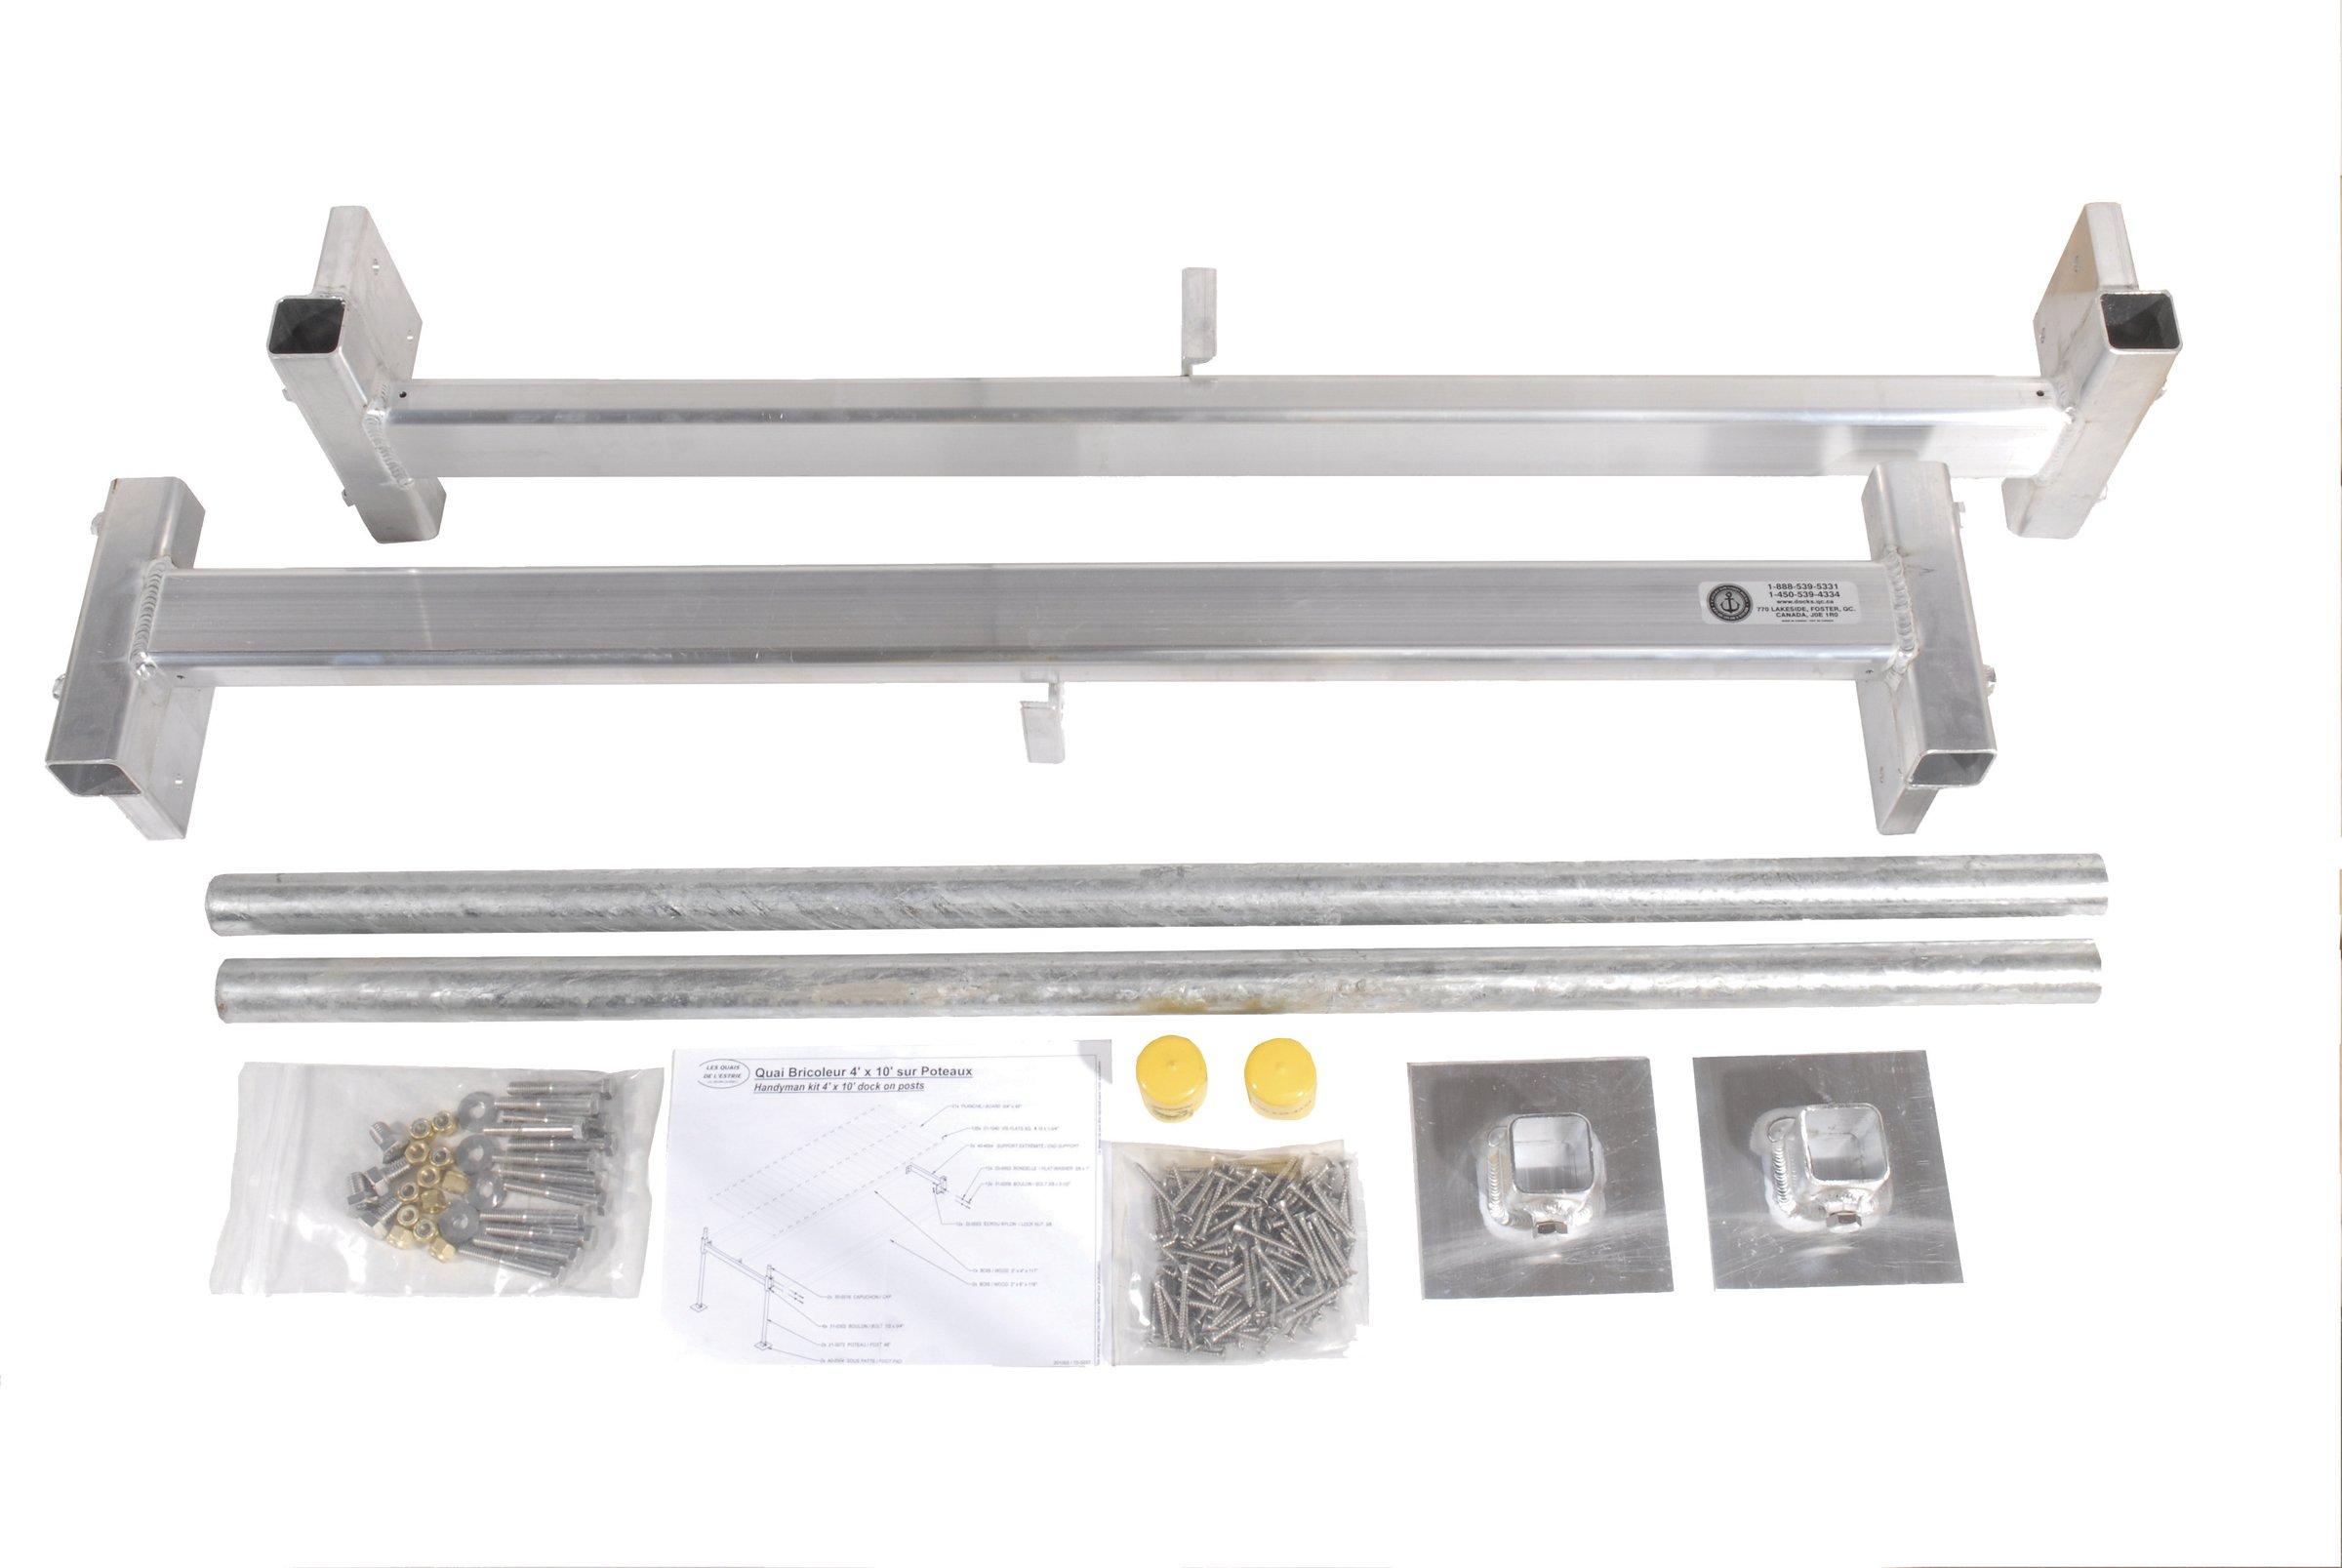 Dock Edge Aluminum Hybrid Floating and Stationary Dock Kit, 4x8-Feet